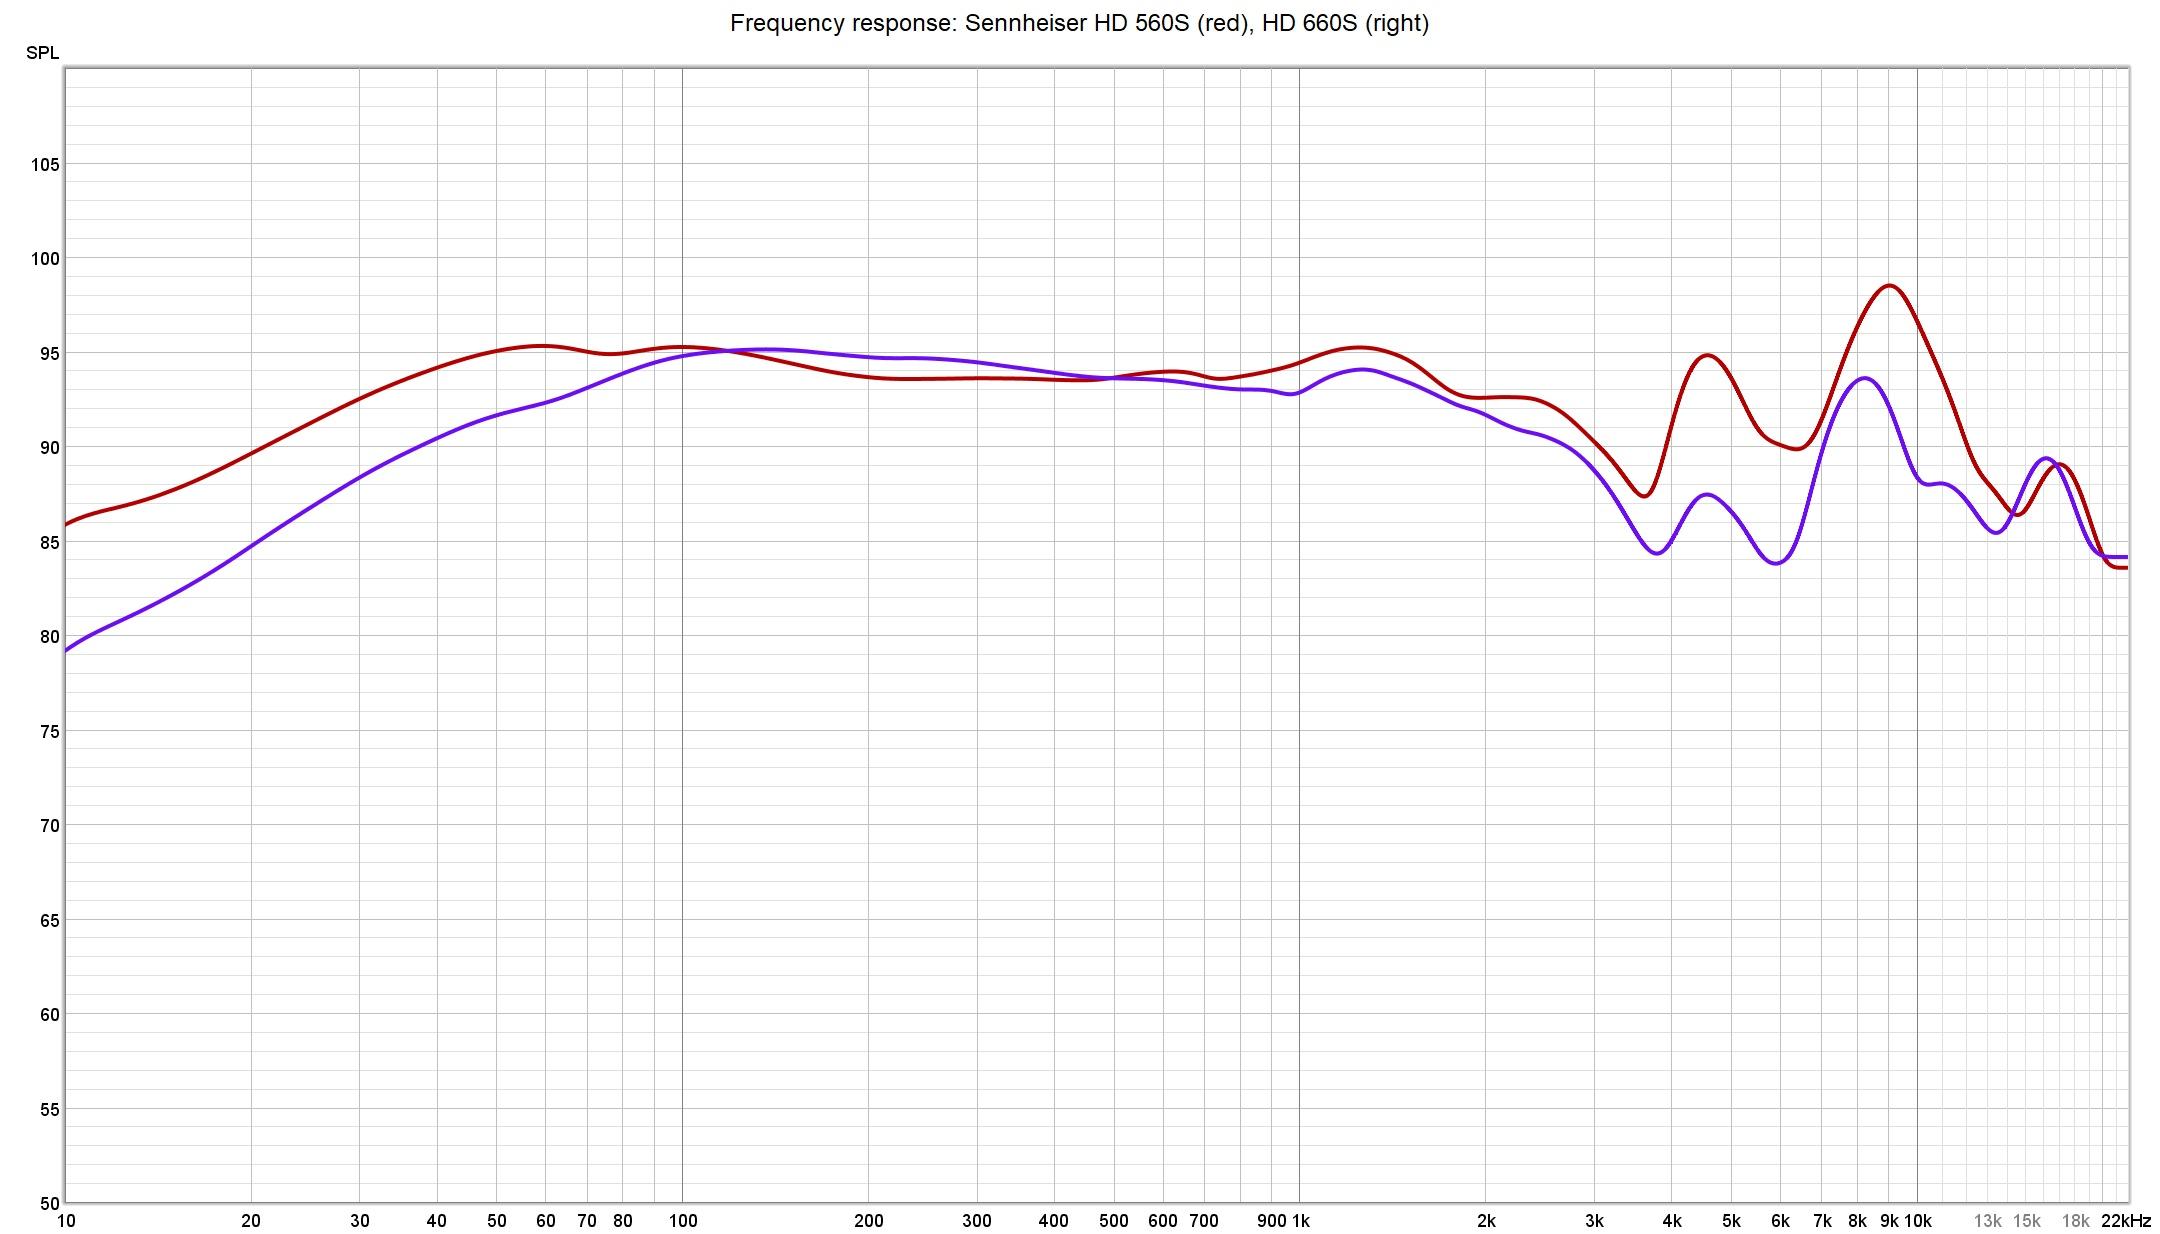 Sennheiser HD 560S vs HD 660S frequency